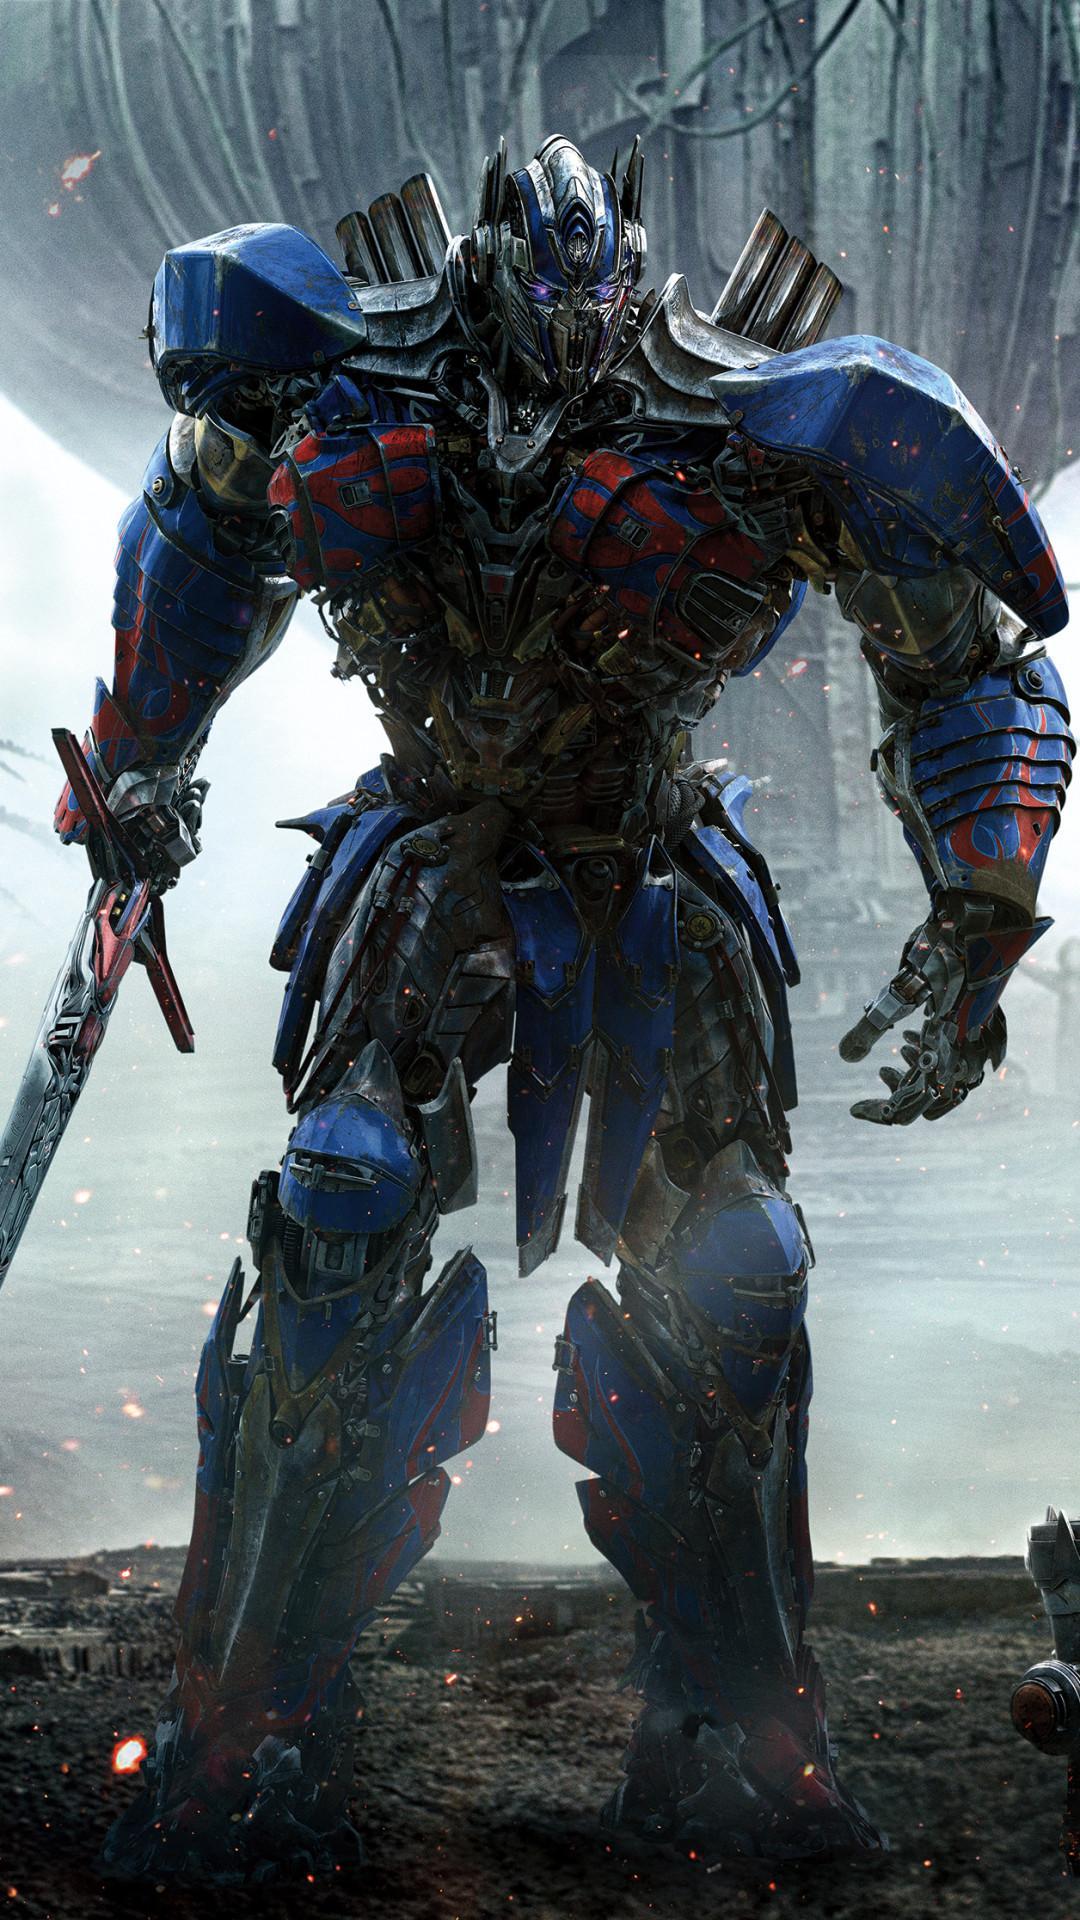 Transformers Optimus Prime Wallpaper Optimus Prime The Last